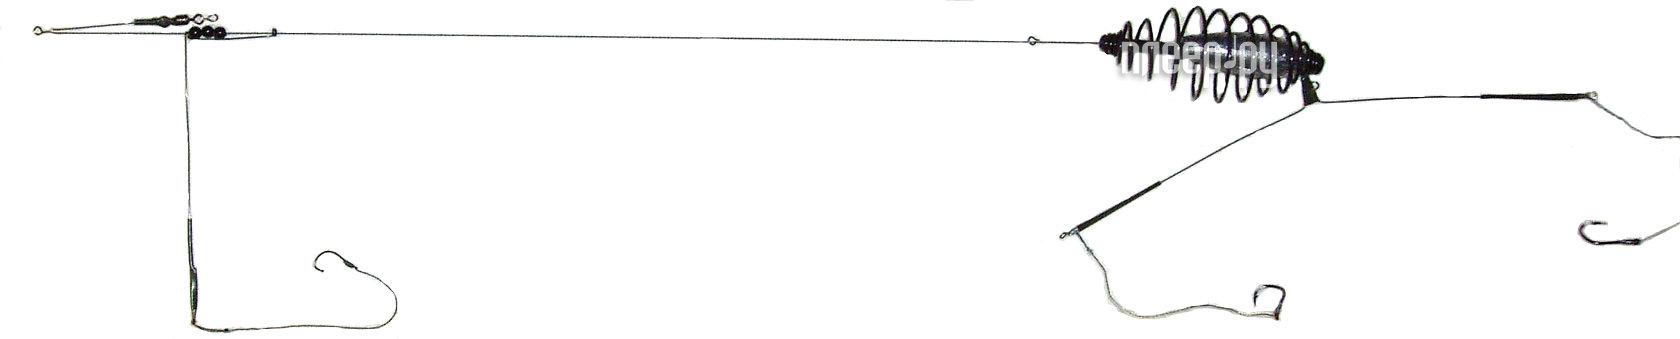 Кормушка Deepriver 15гр, крючок №4 OD-03-015-04